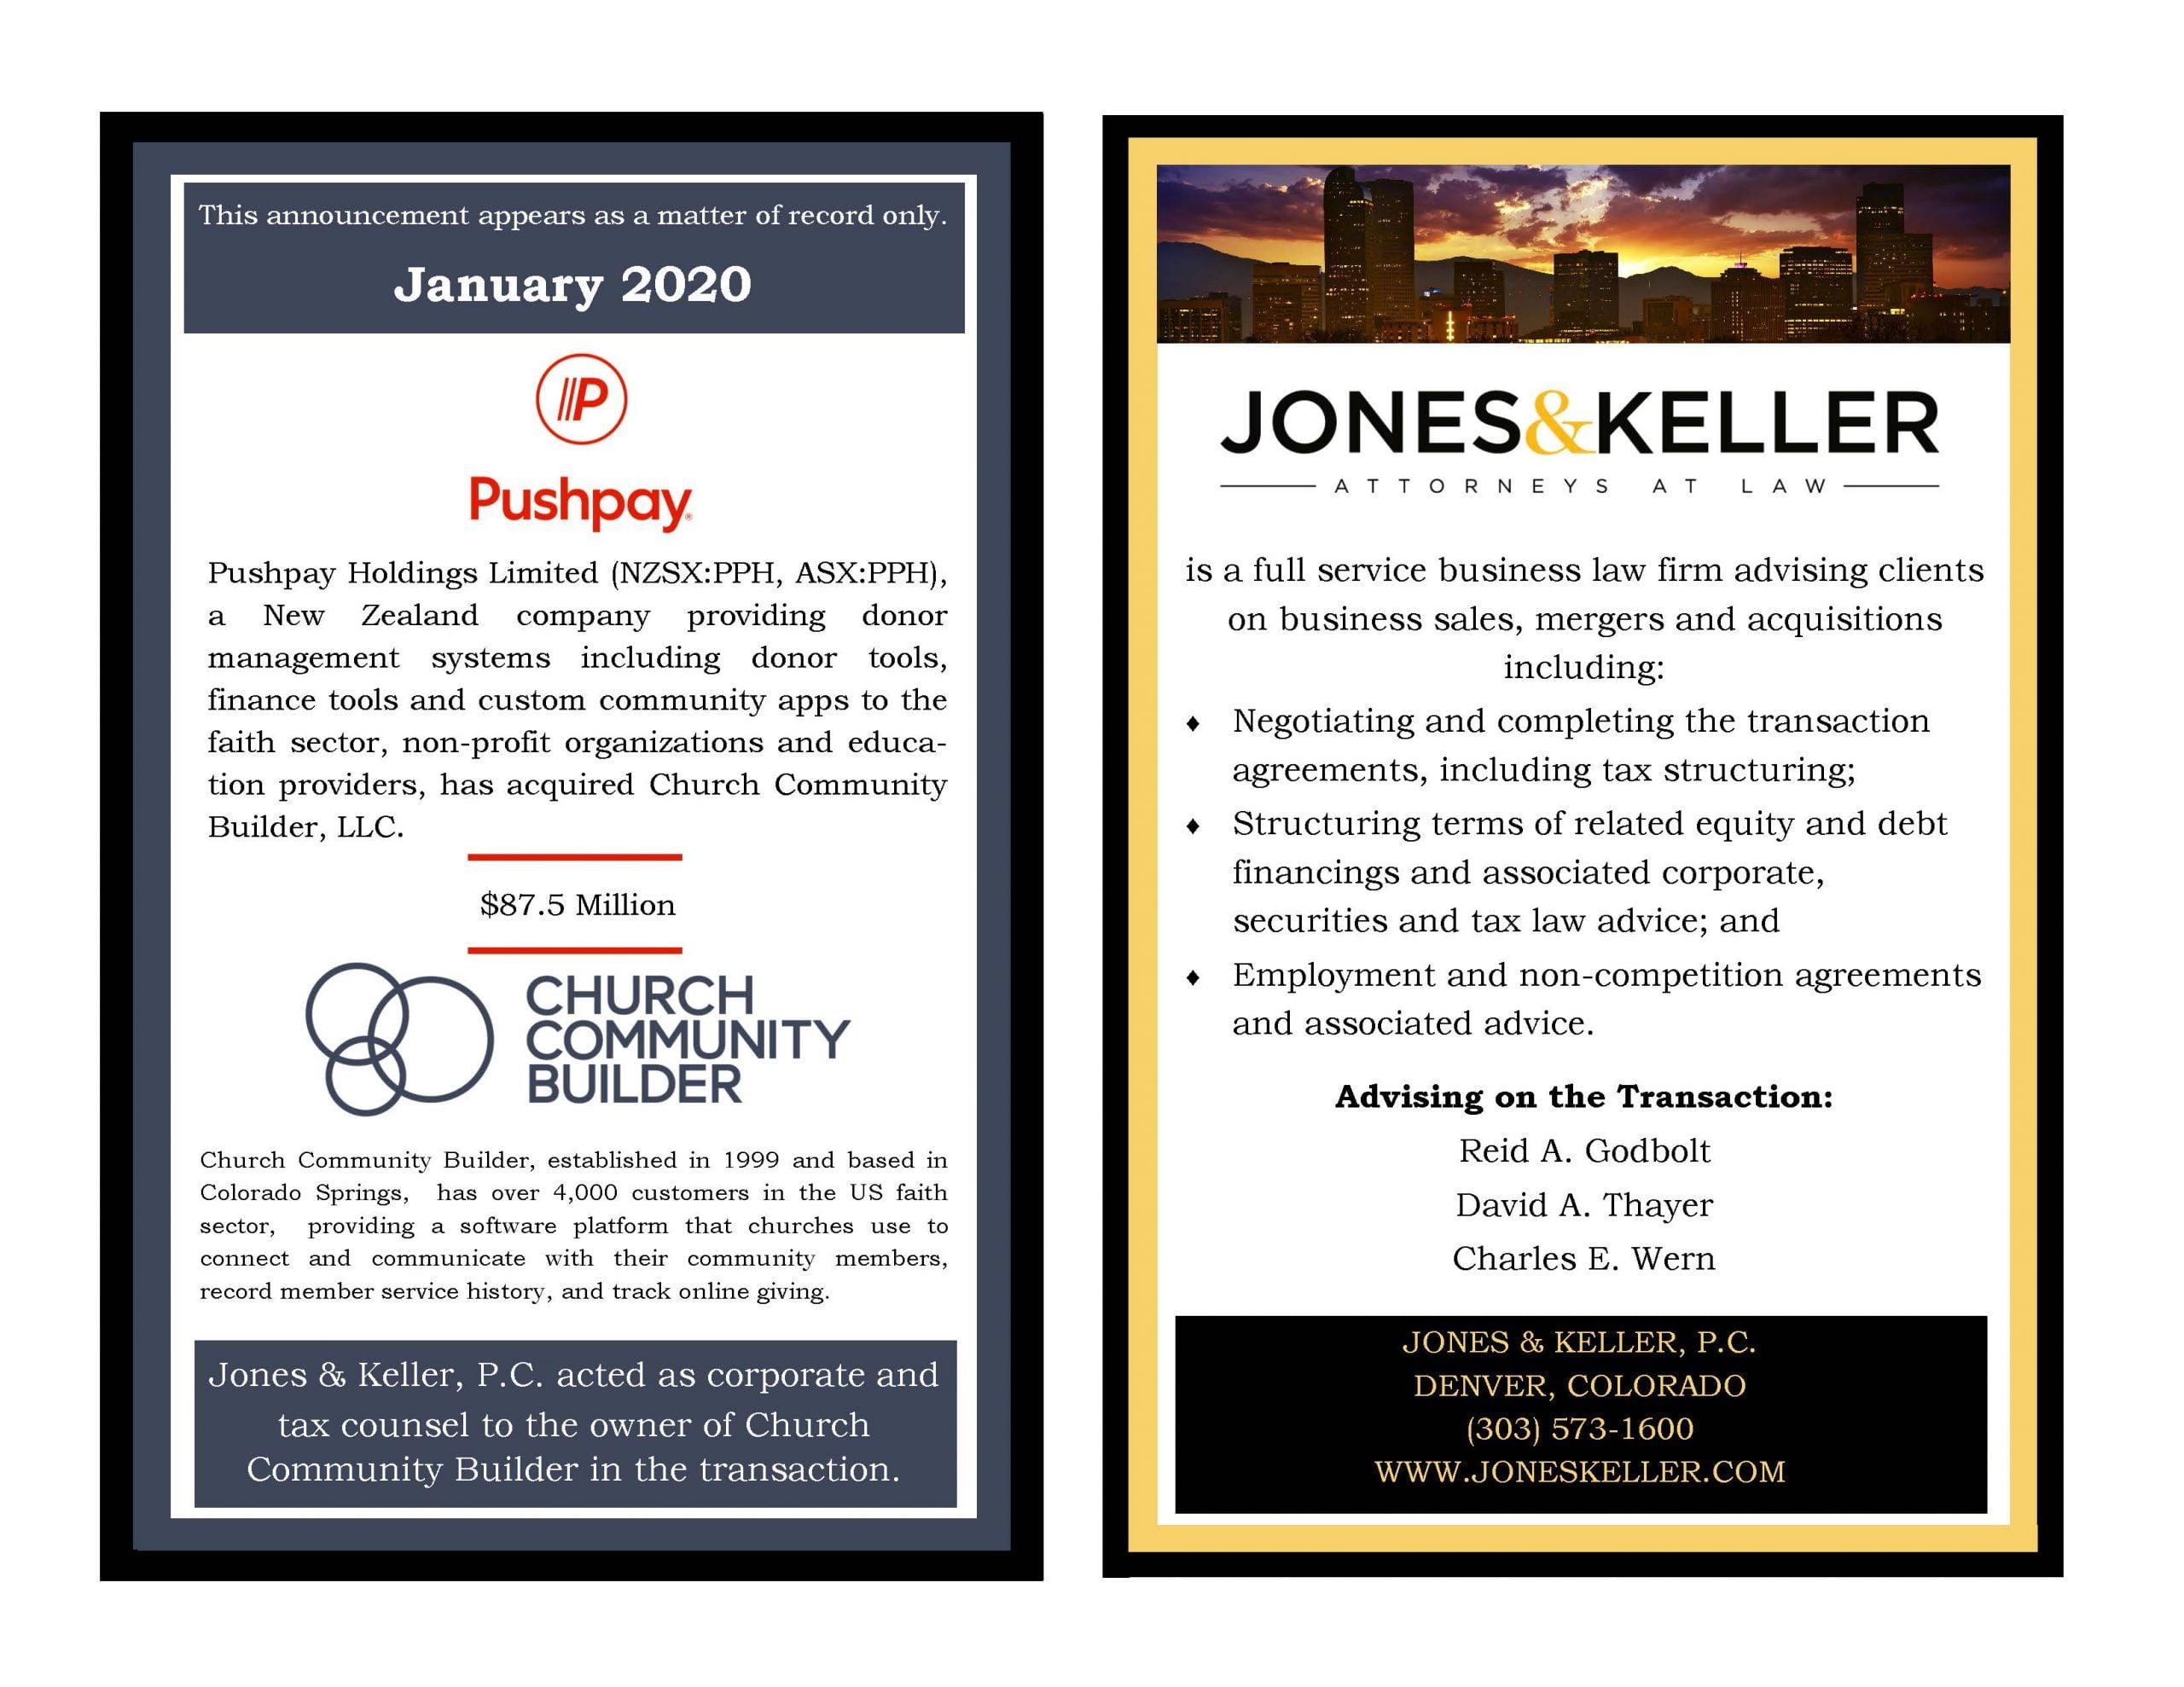 JONES & KELLER ADVISES CHURCH COMMUNITY BUILDER IN ITS ACQUISITION BY PUSHPAY HOLDINGS